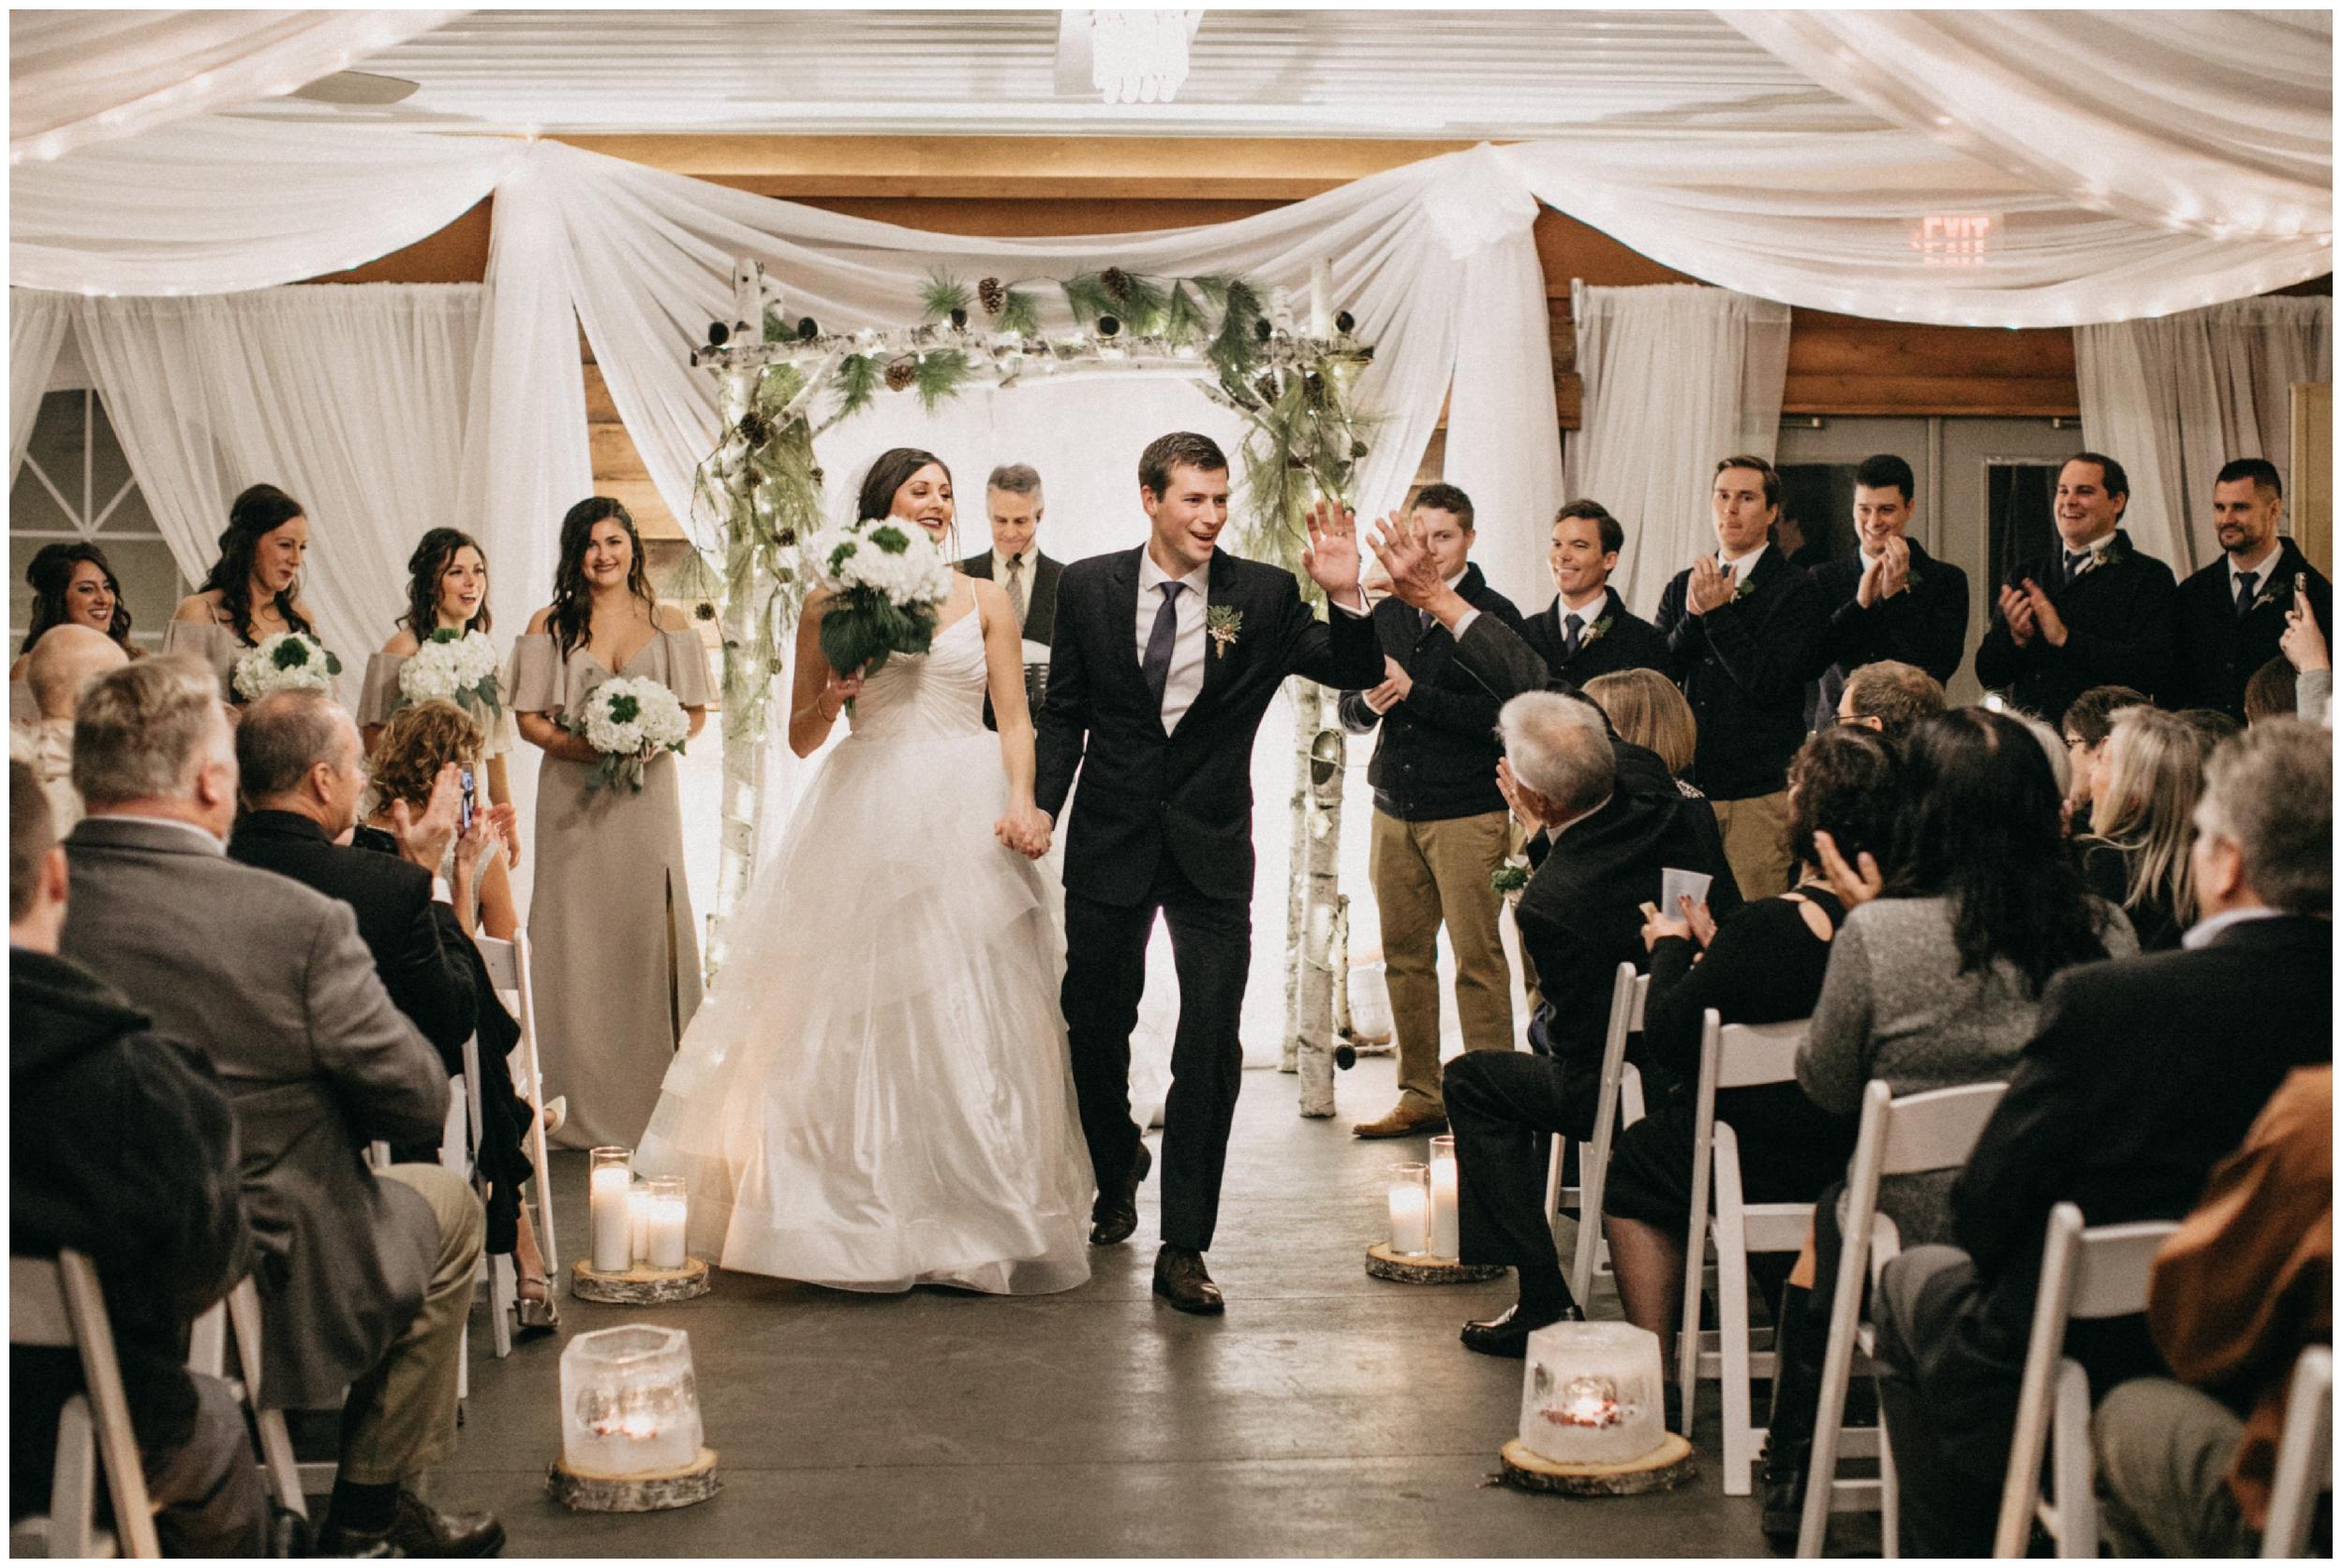 pine-peaks-winter-wedding-ceremony-109.jpg